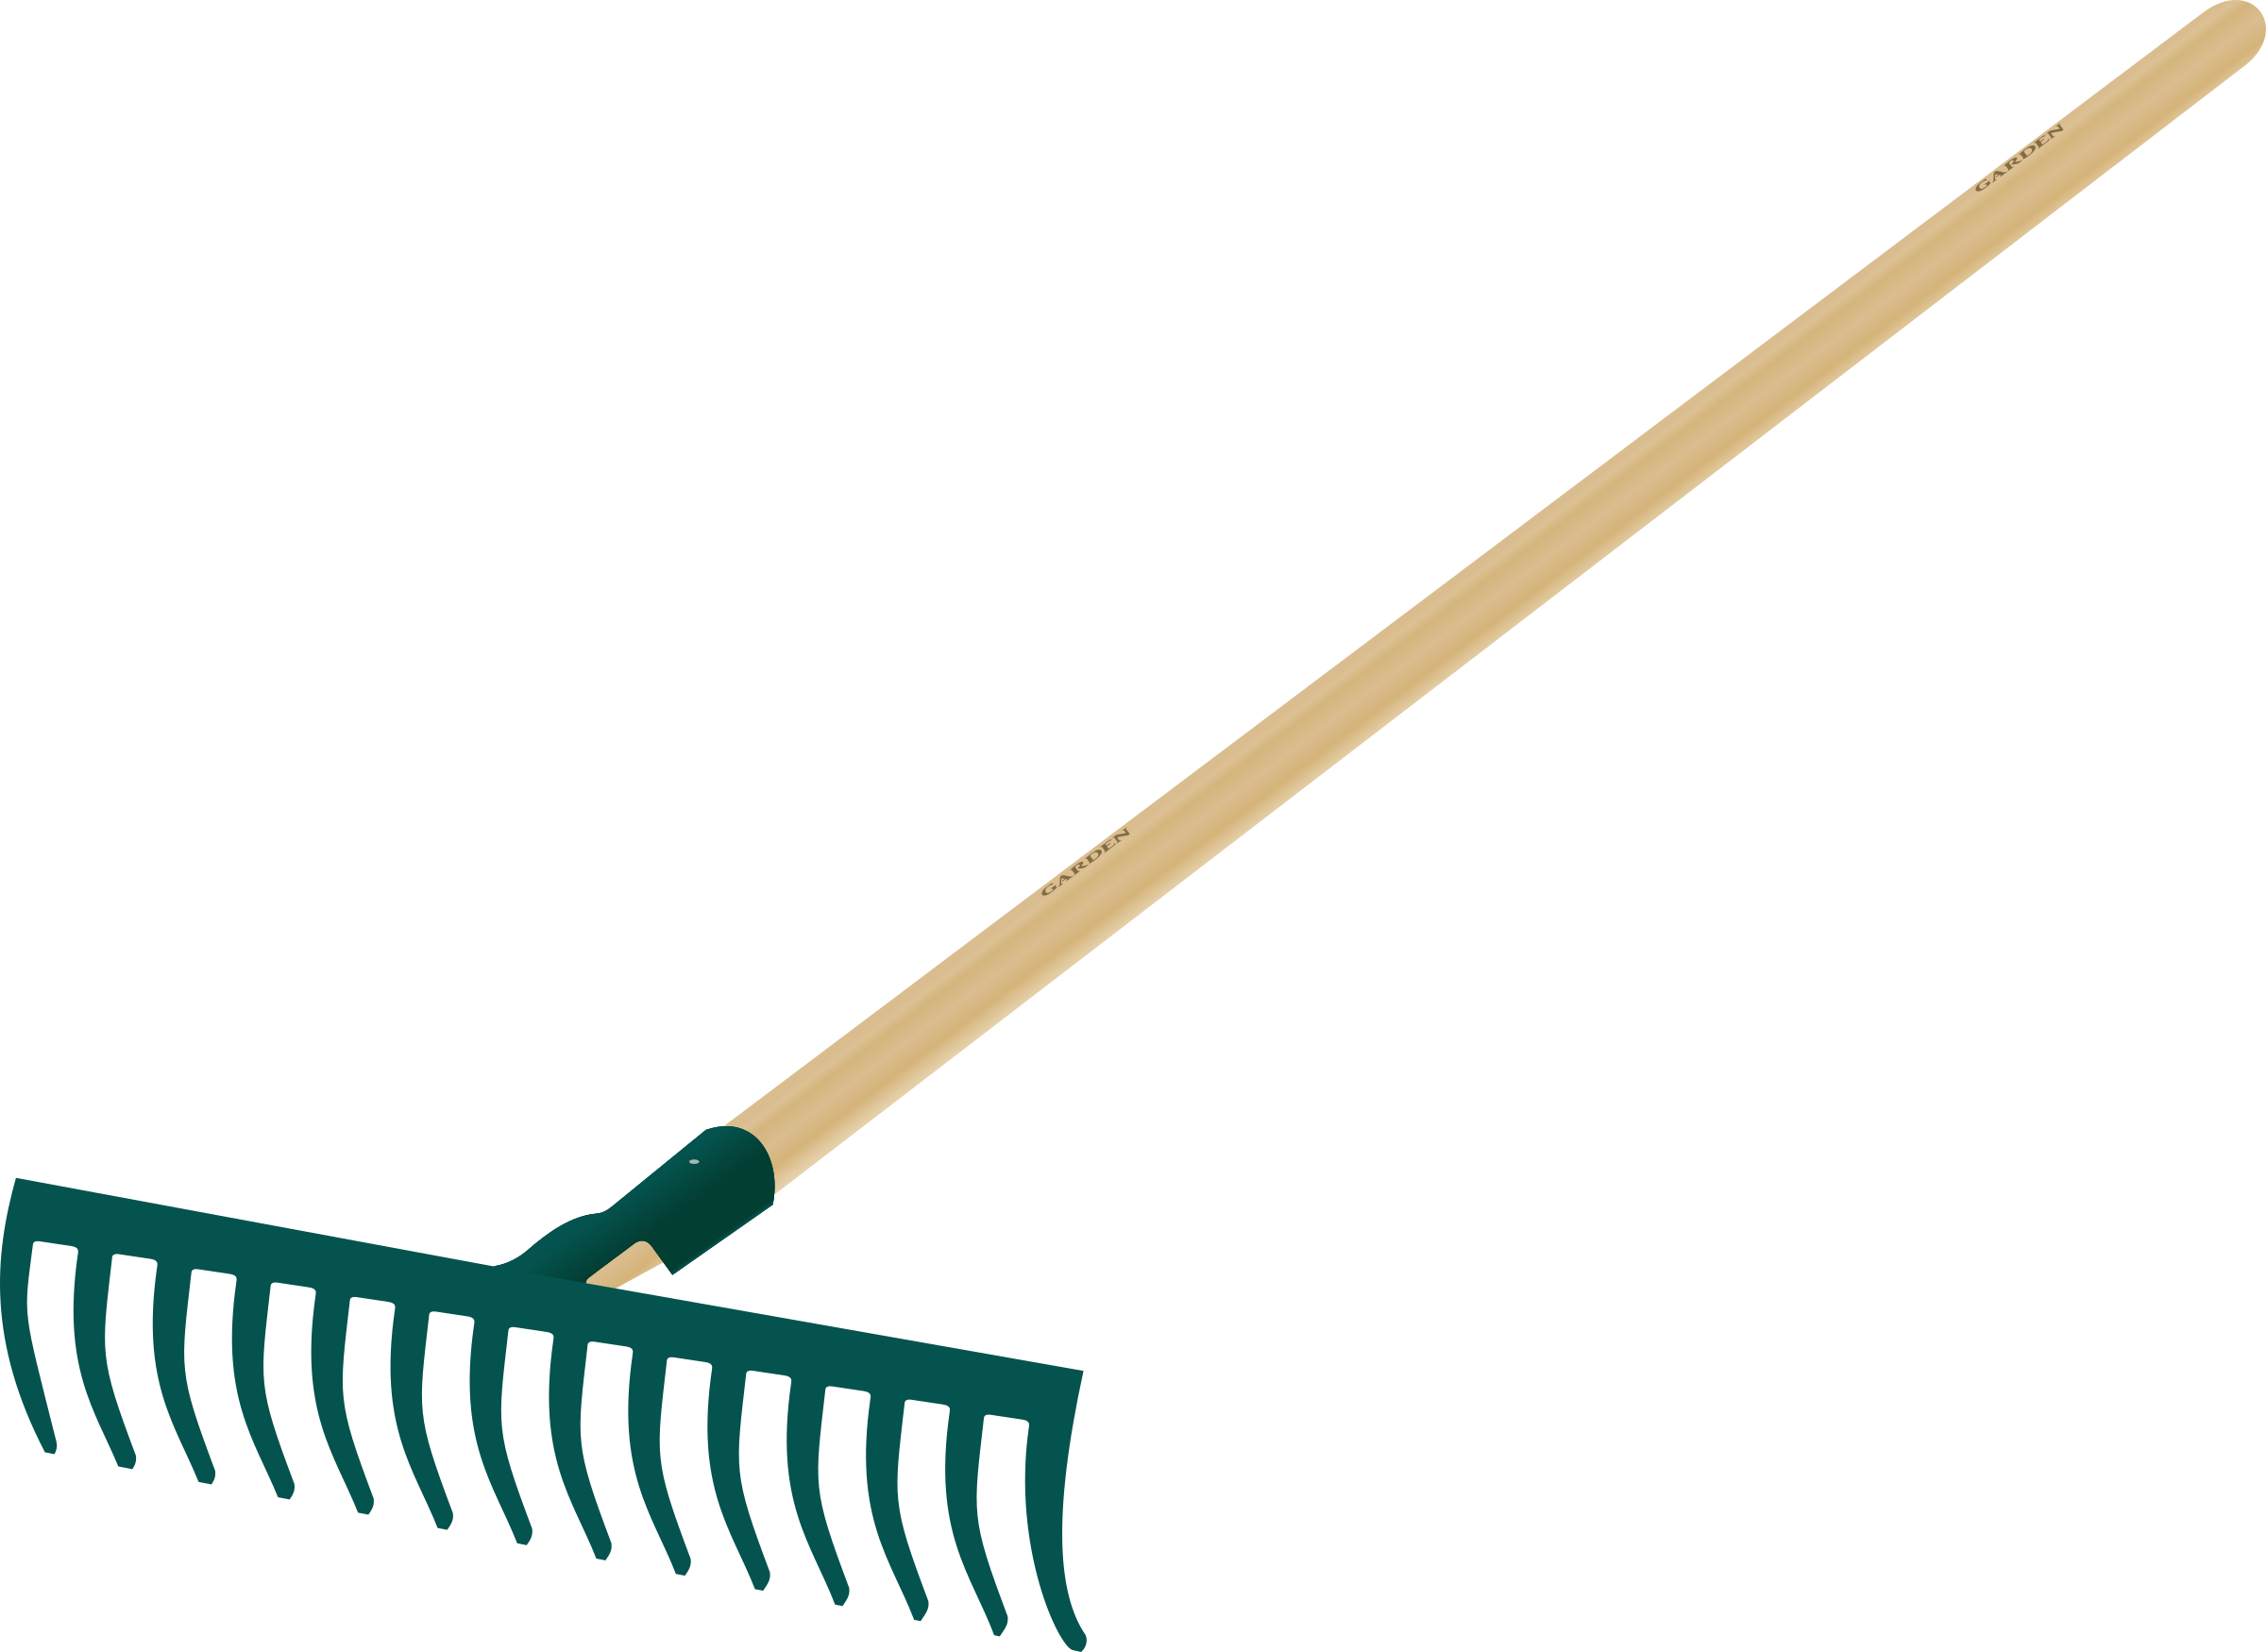 Clipart rake tool for Large rake garden tool